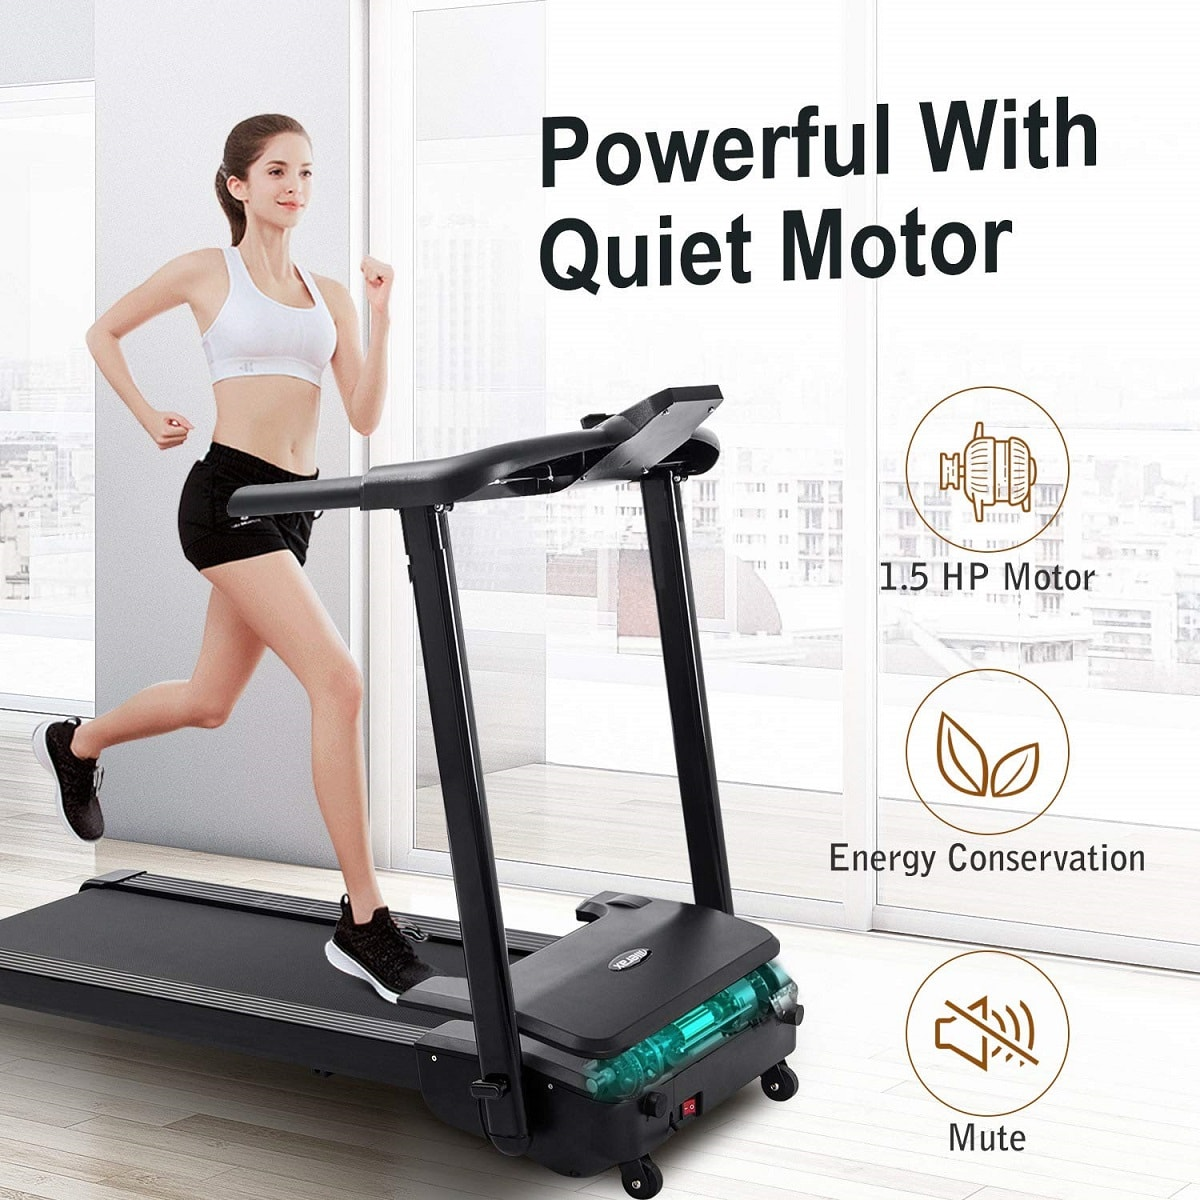 merax treadmill image